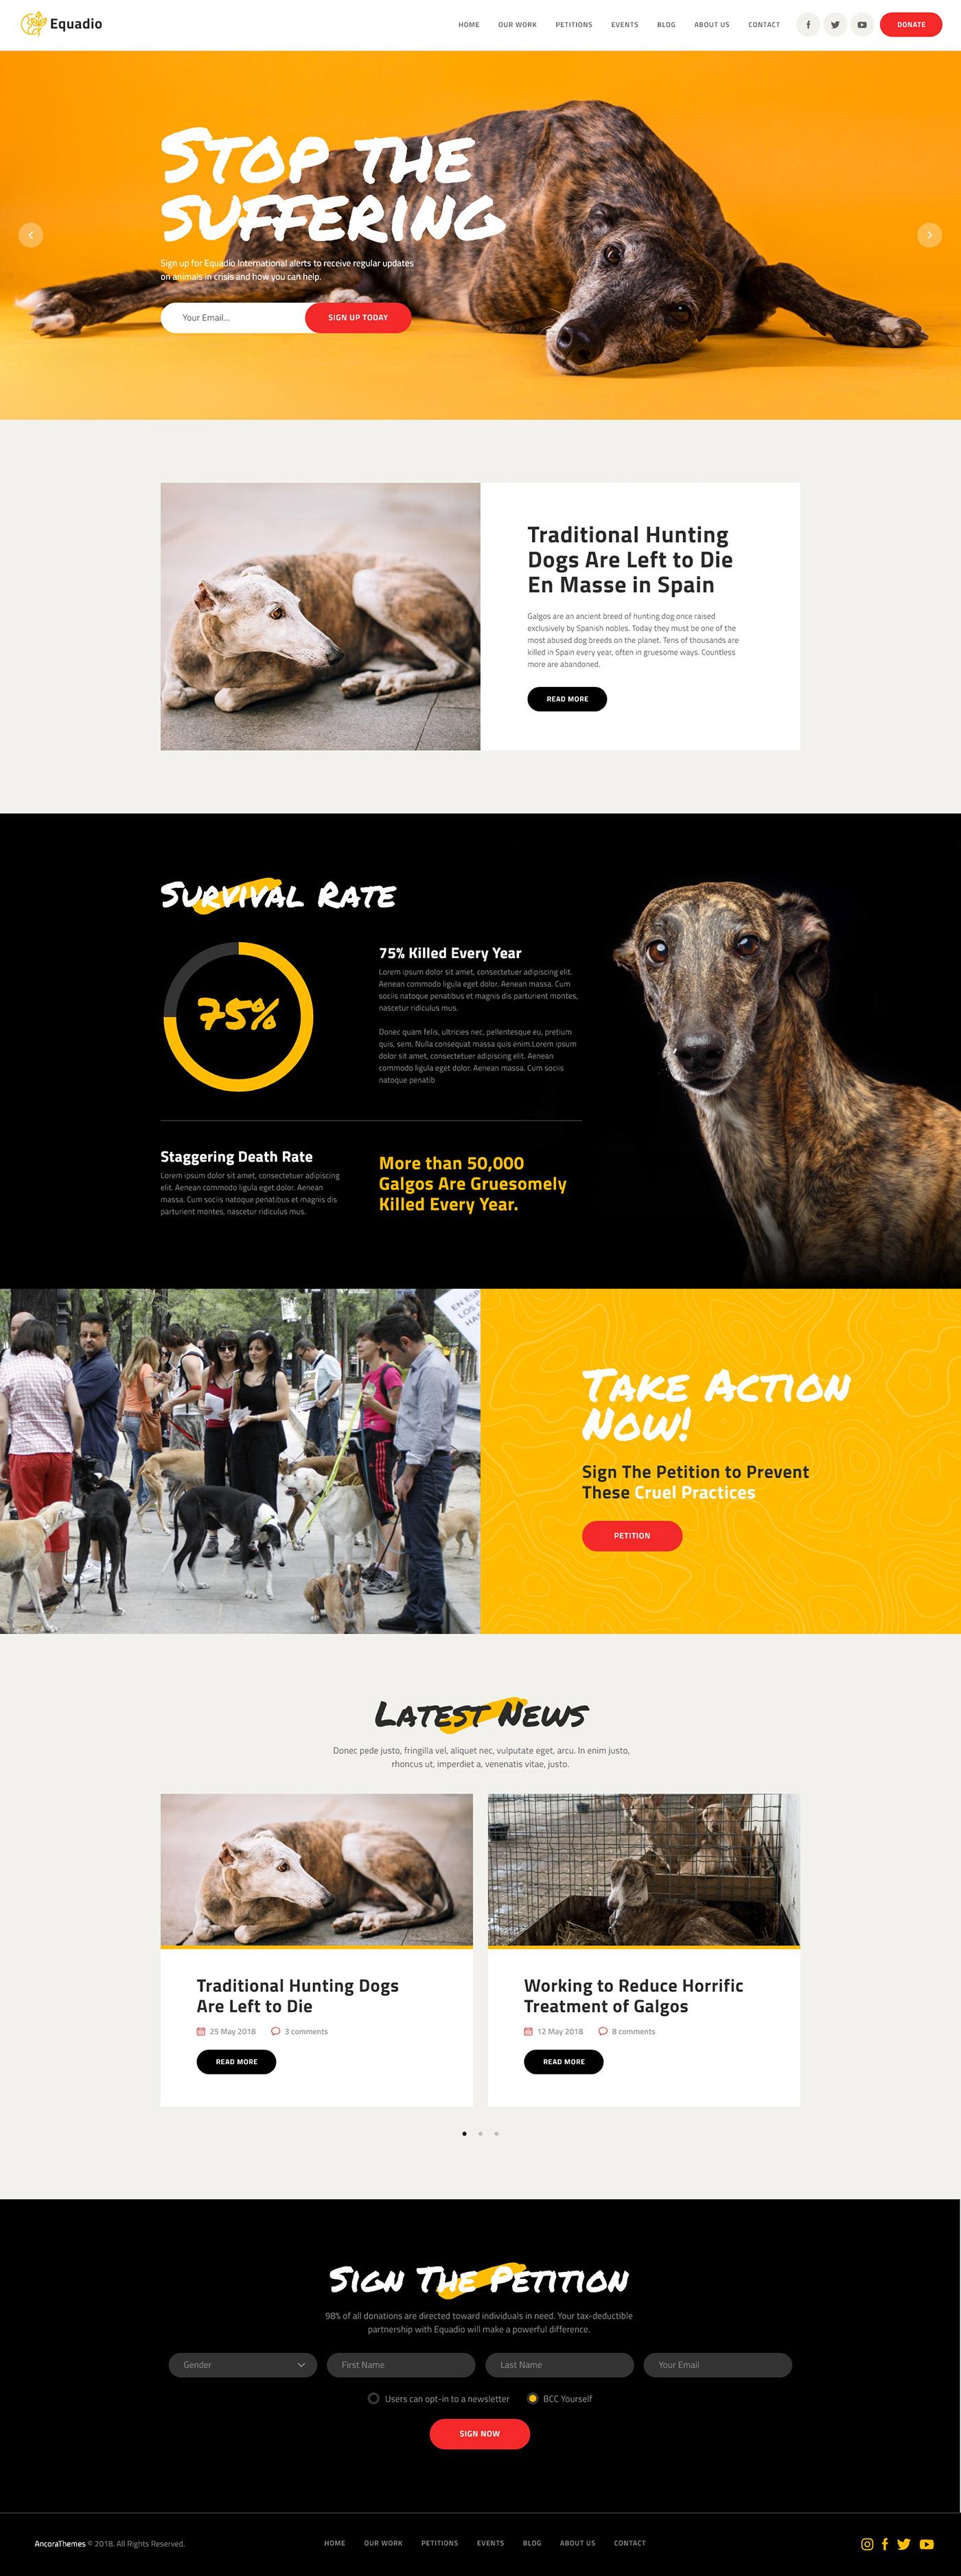 Image may contain: dog, animal and carnivore